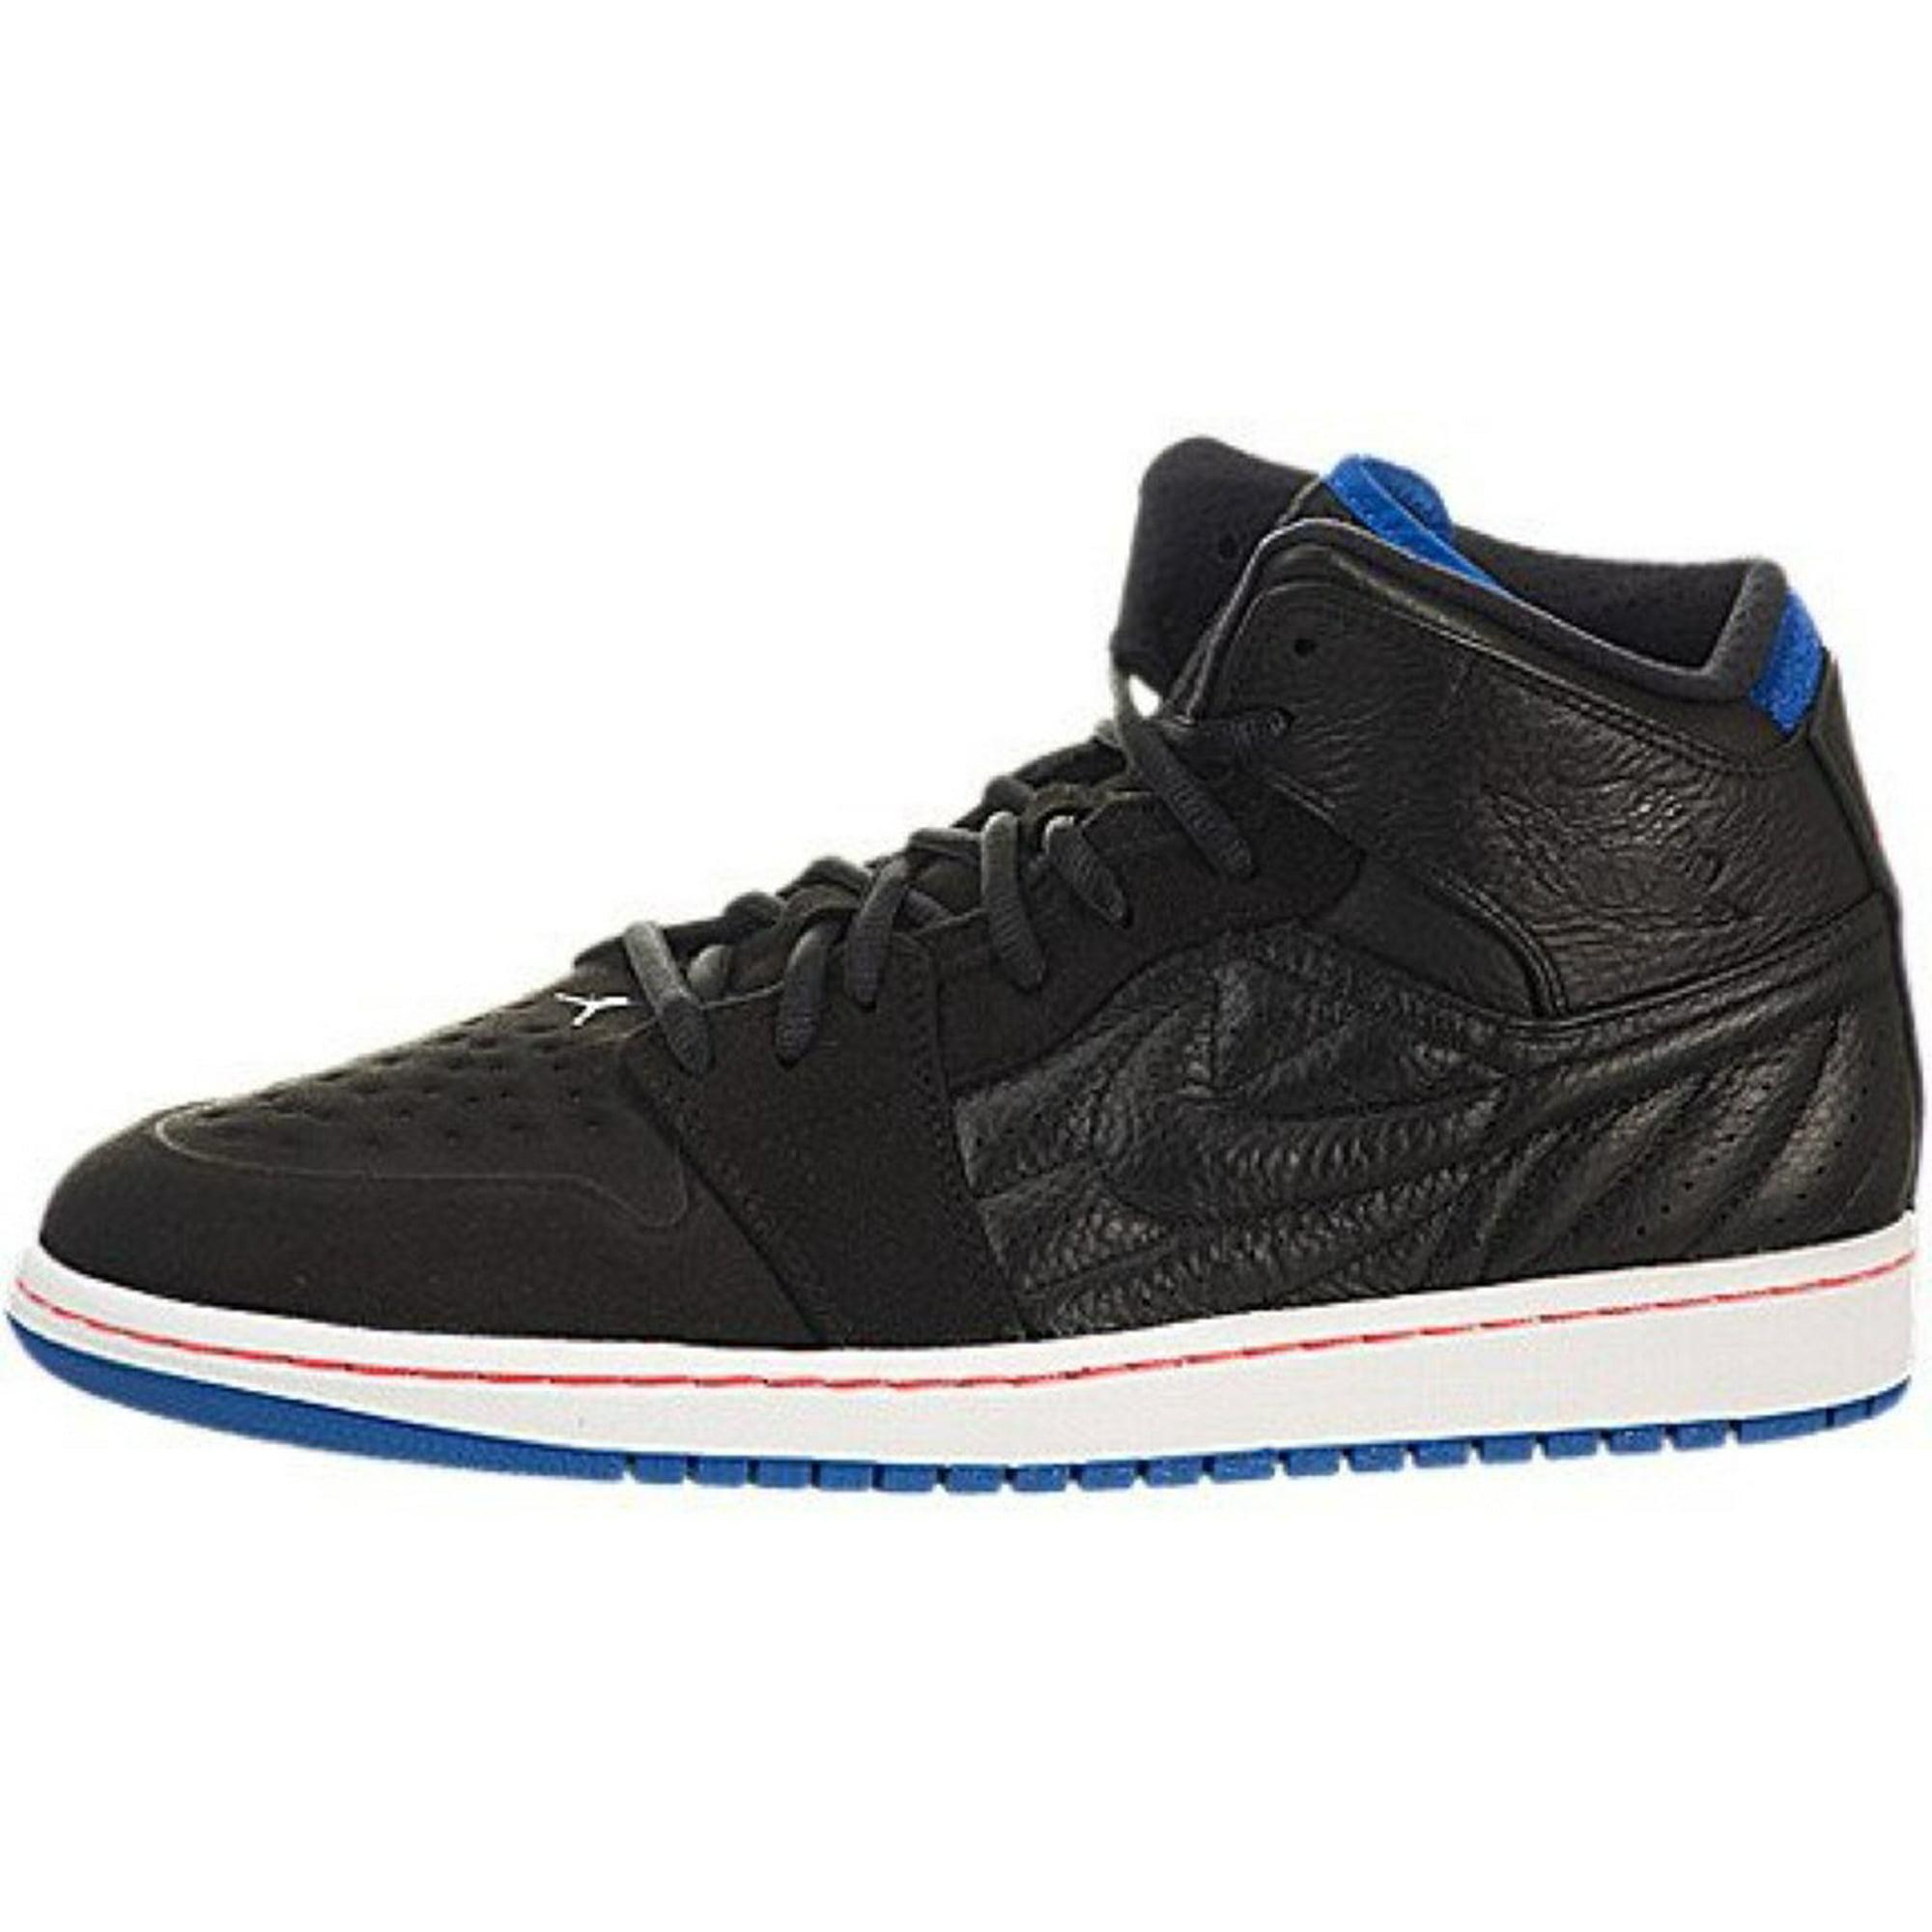 ba2c3d8aaf4 Air Jordan - Men - Air Jordan 1 Retro 99 - 654140-007 - Size 12 | Walmart  Canada